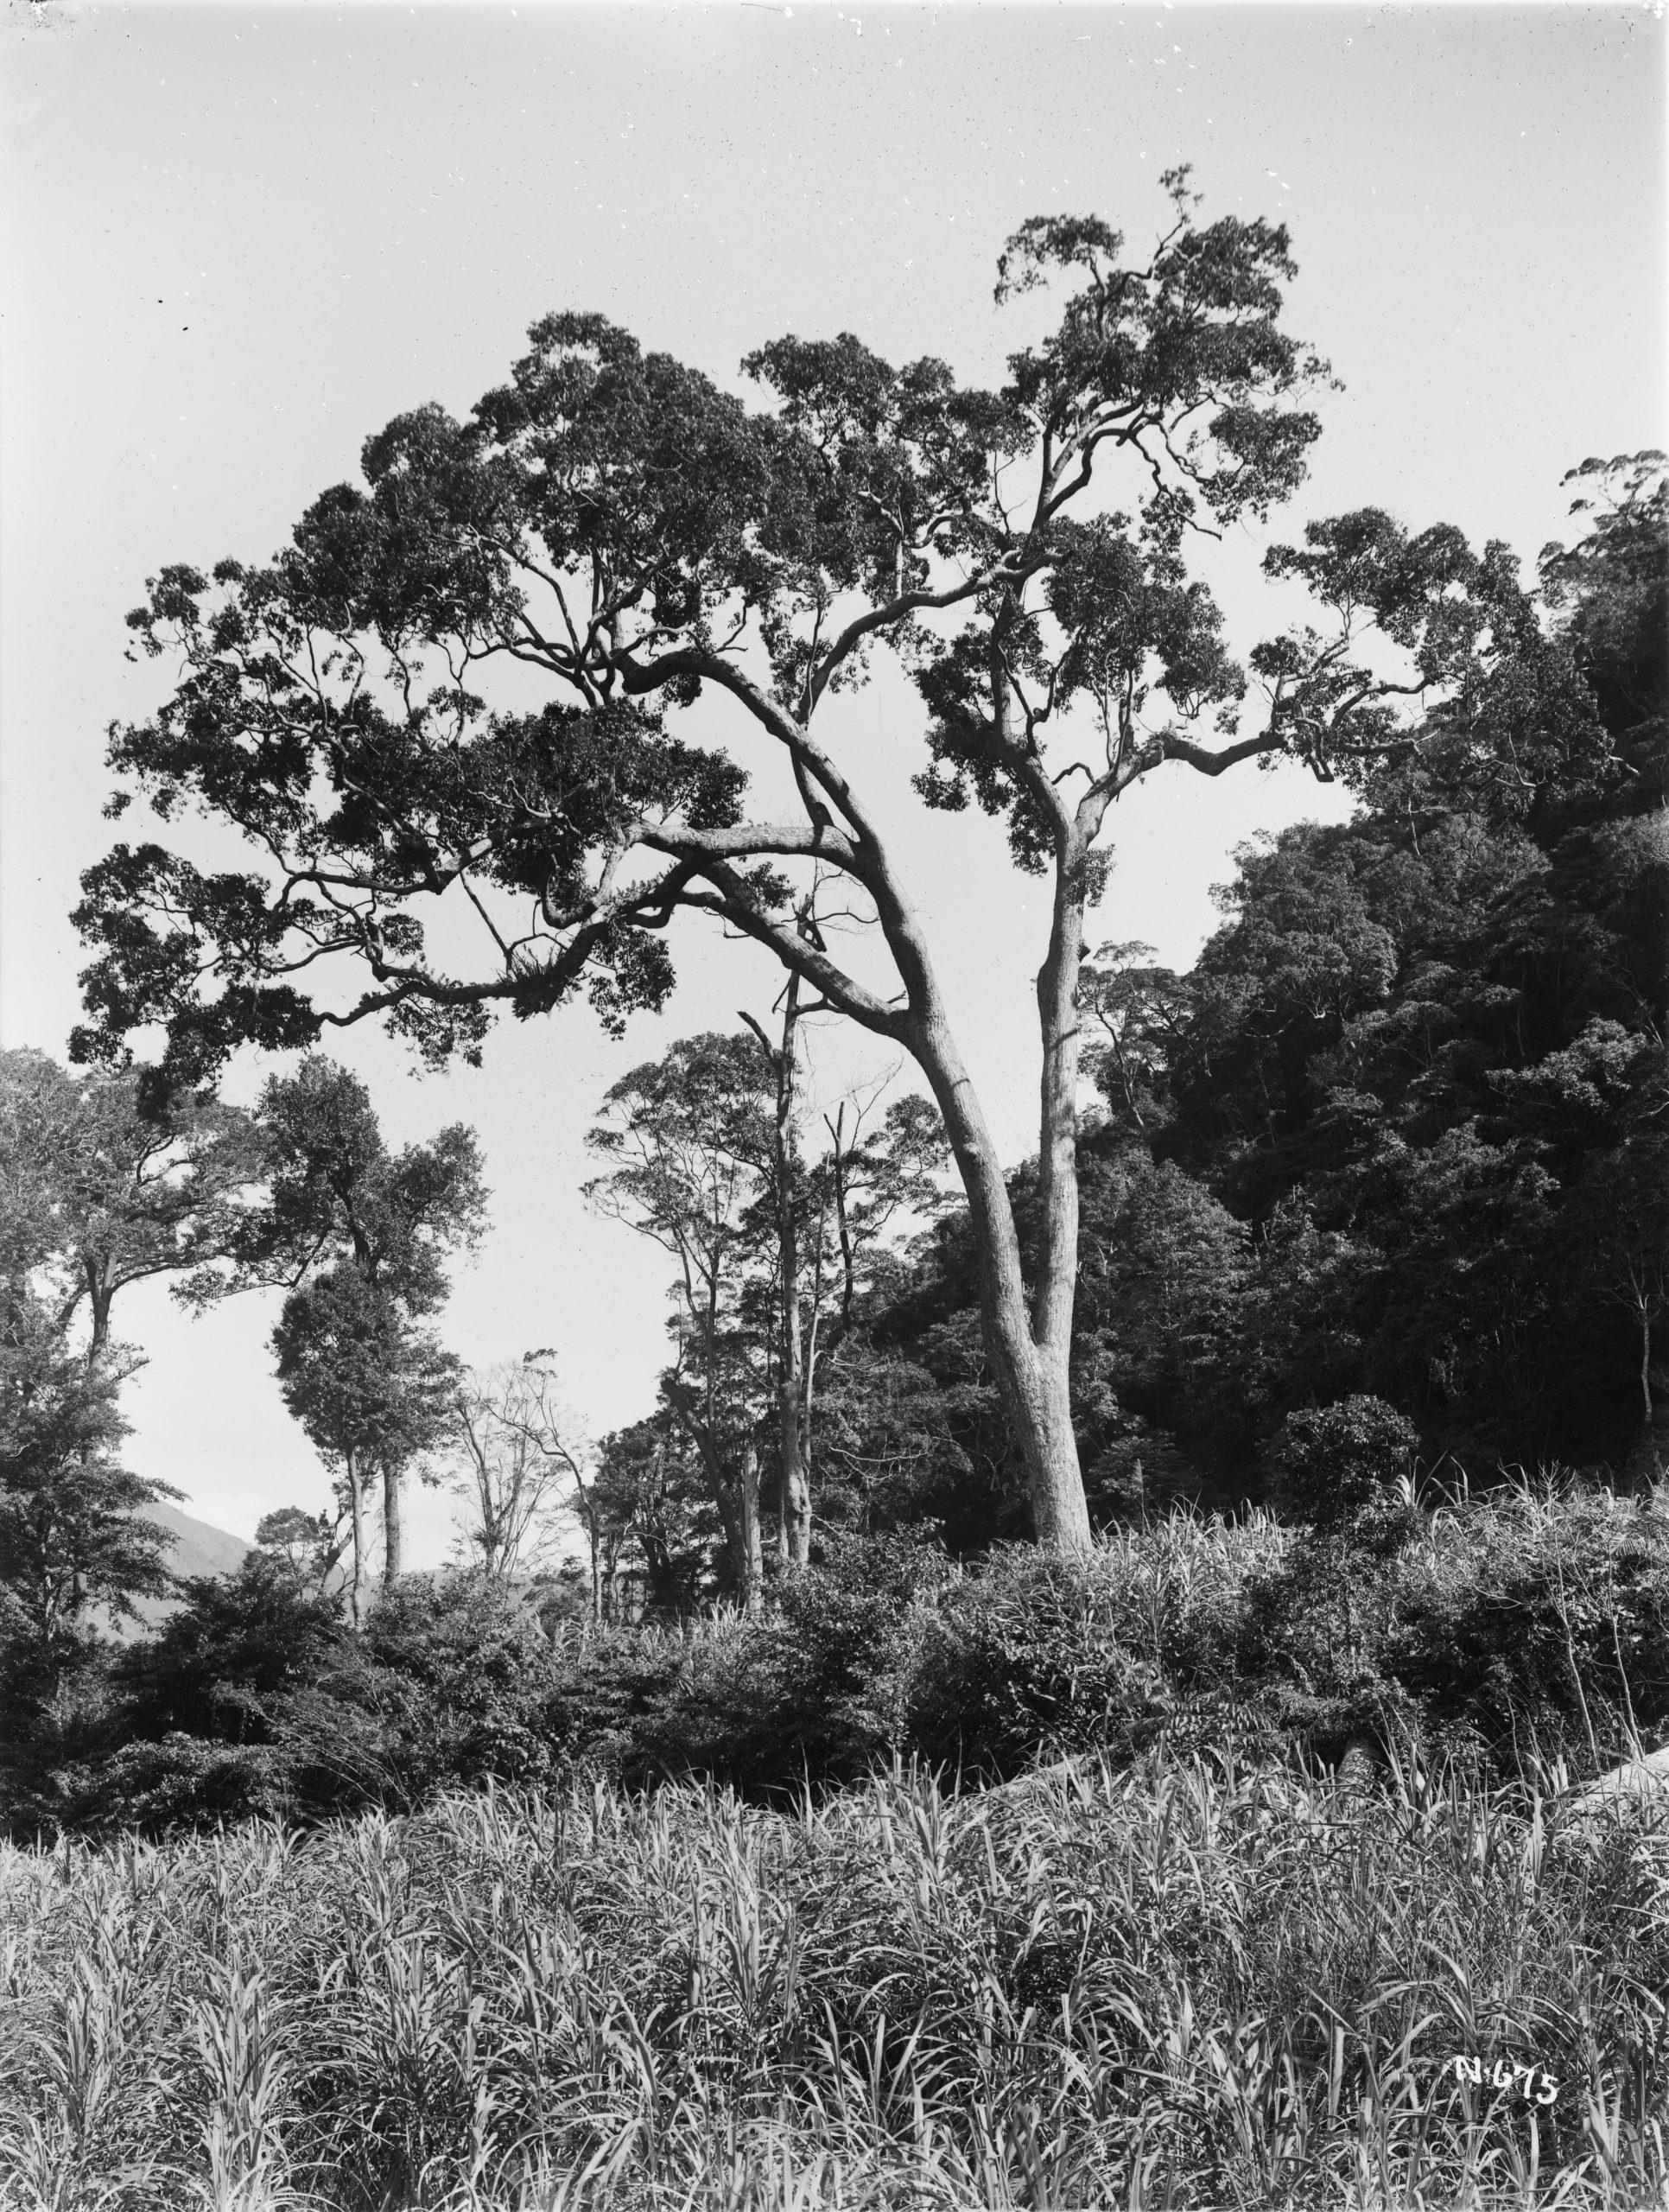 A camphor tree (Cinnamomum camphora) grows beside a sugarcane field near Horisha, Taiwan in this December 1918 photograph by Ernest Wilson.